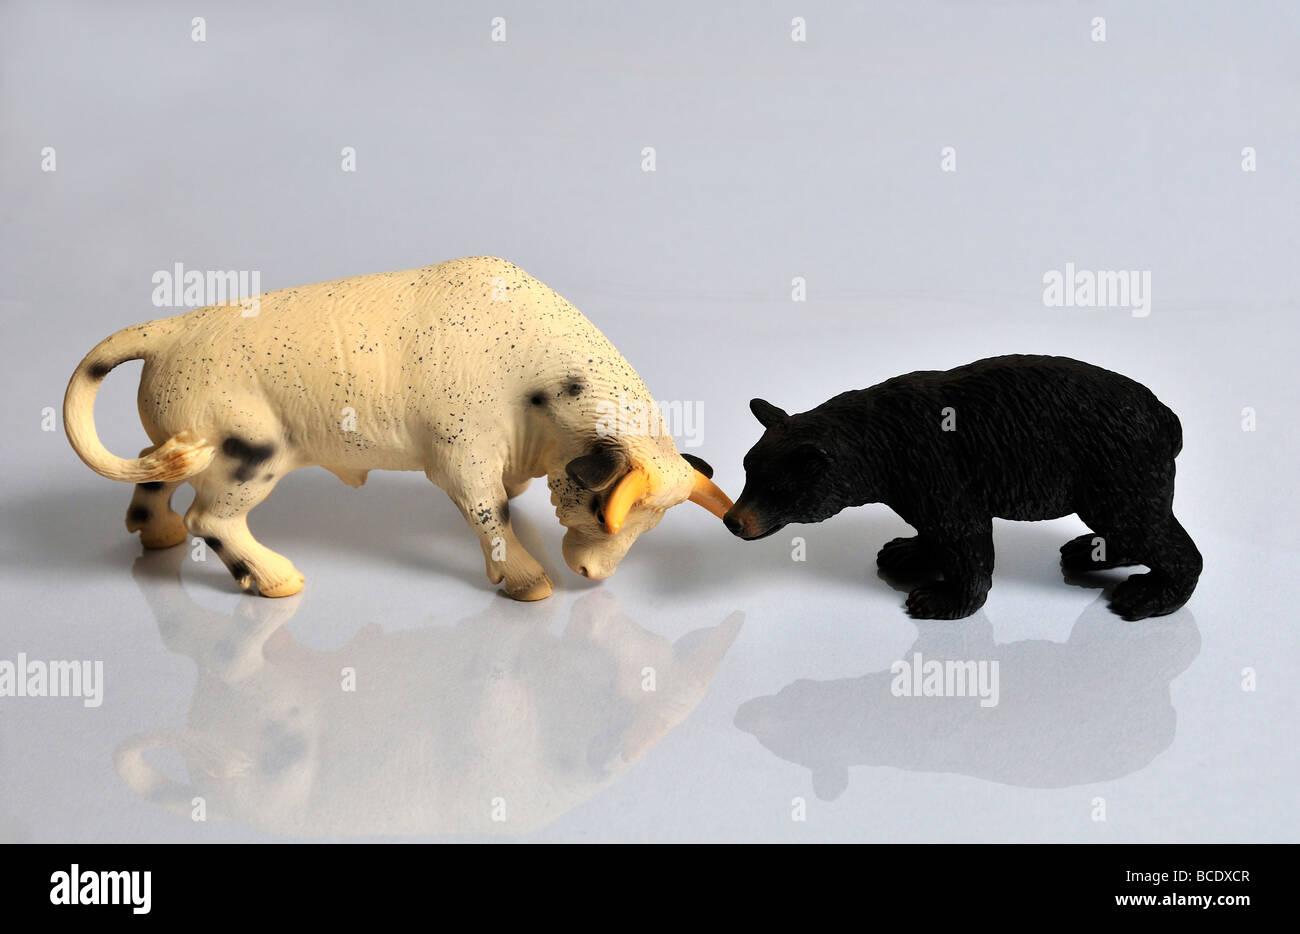 Bear and bull - Stock Image